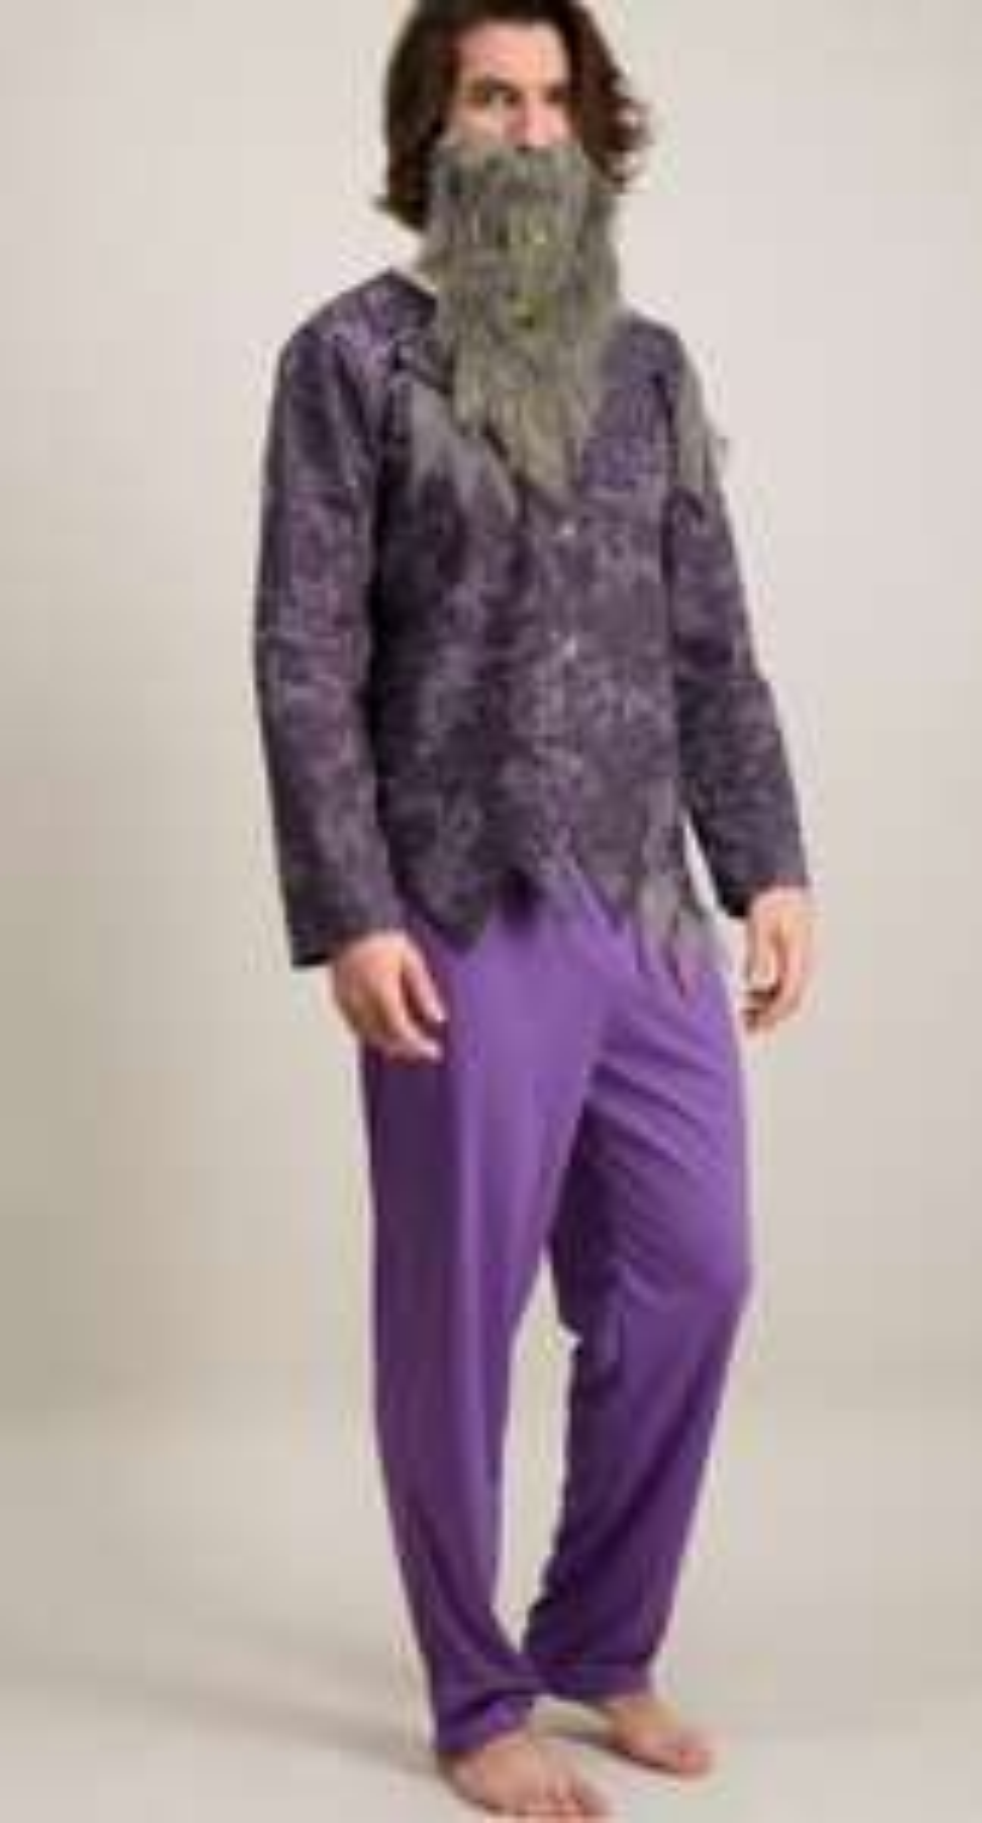 Roald Dahl Mr Twit Costume £6 @ Sainsbury's (£3.95 P&P)